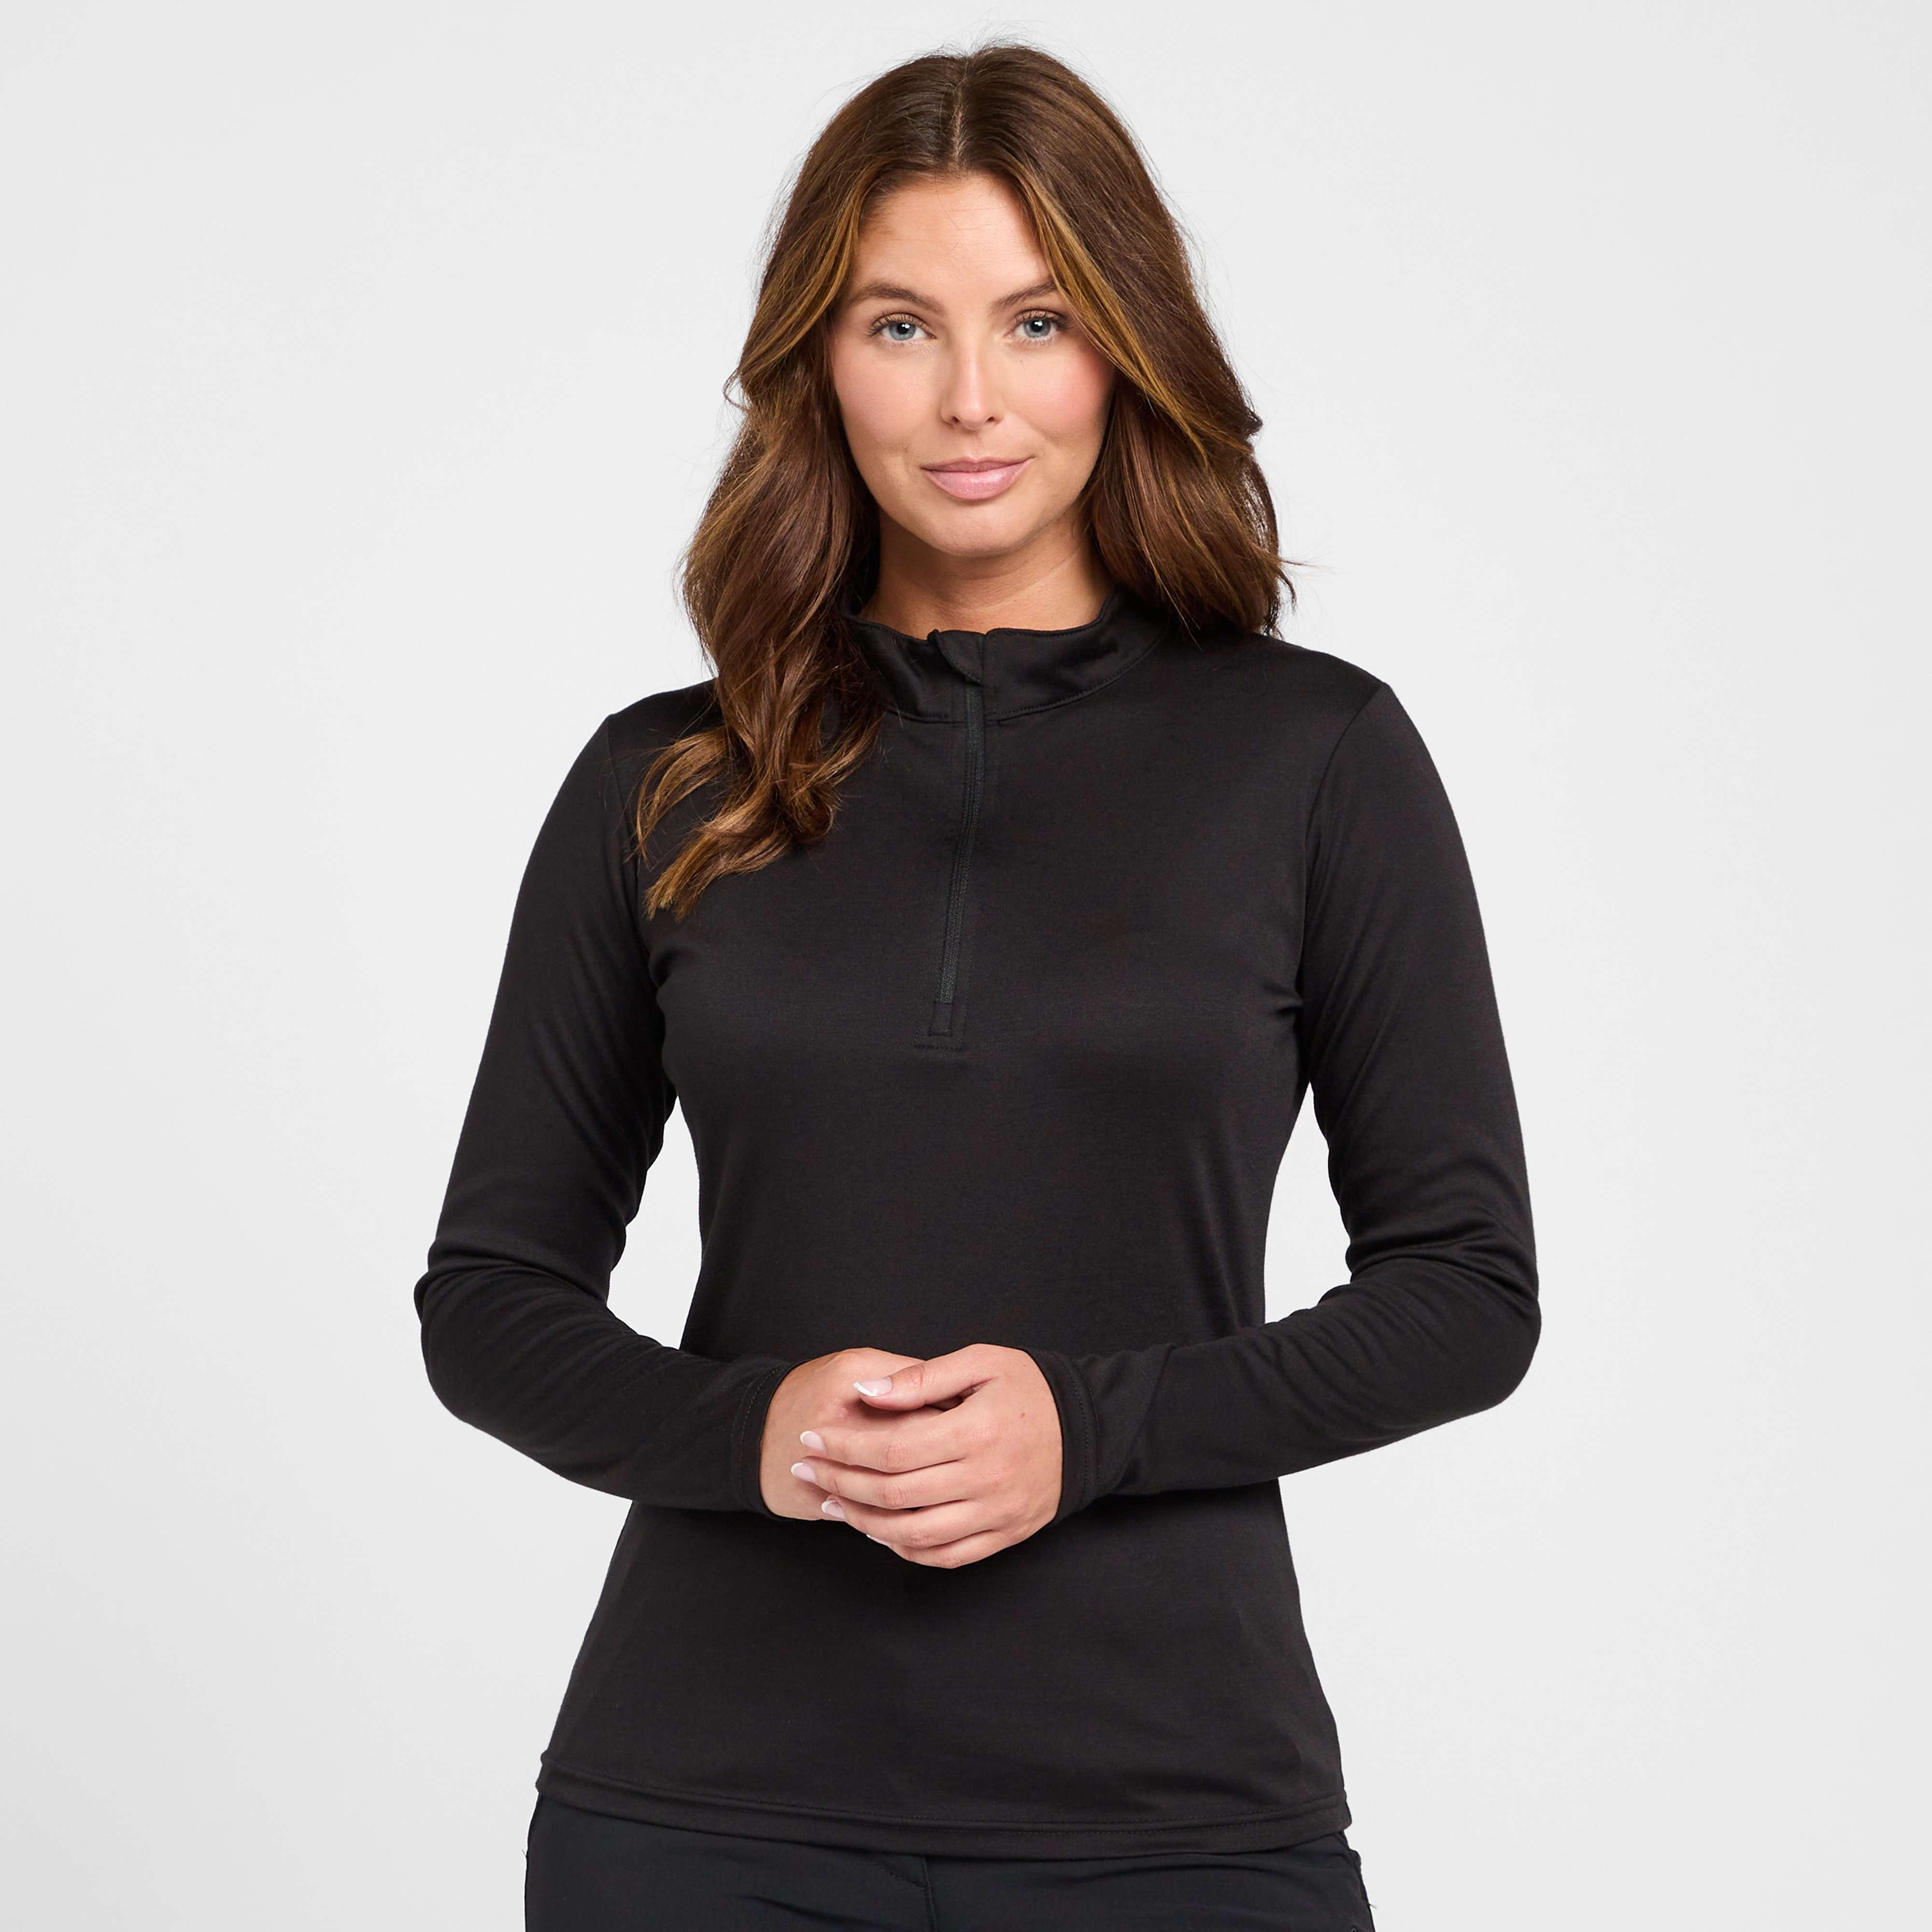 PETER STORM Women's Long Sleeve Zip Neck Thermal T-Shirt